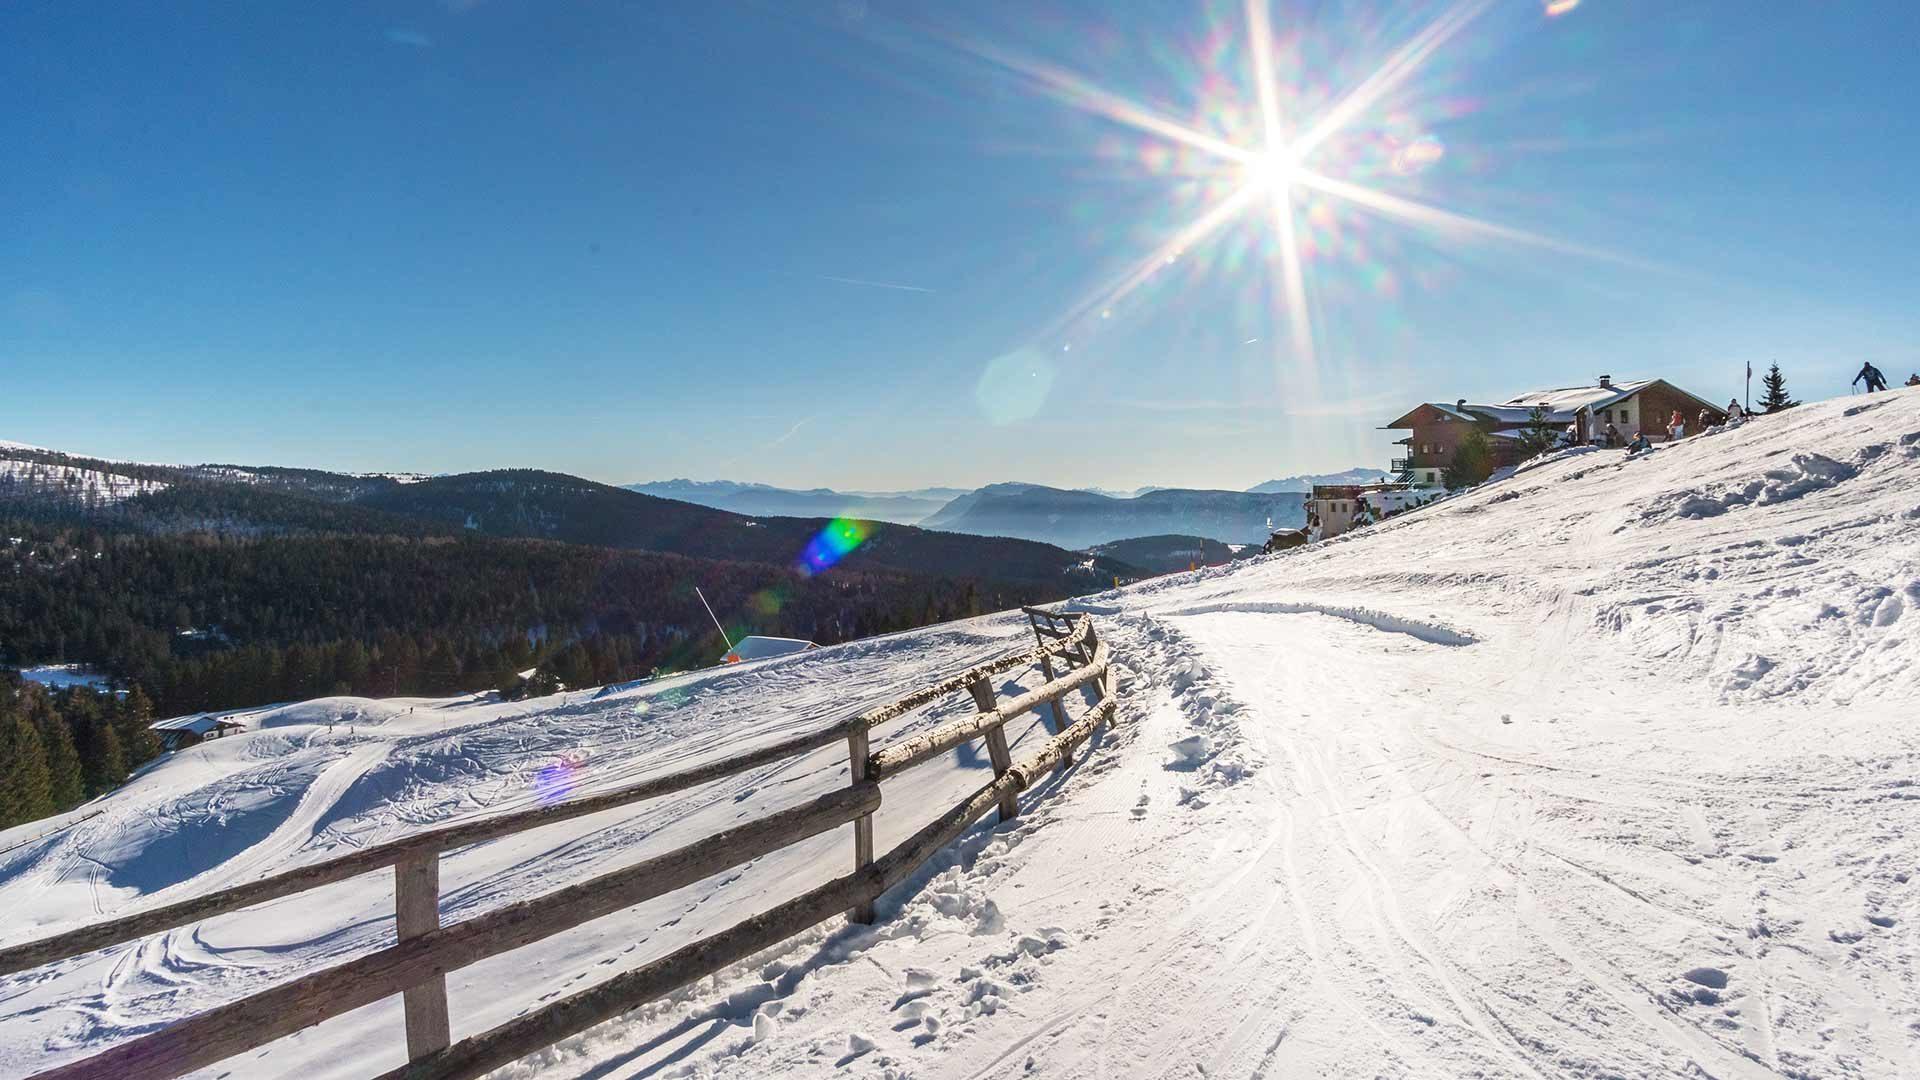 Skigebiet Meran 2000 - Panorama